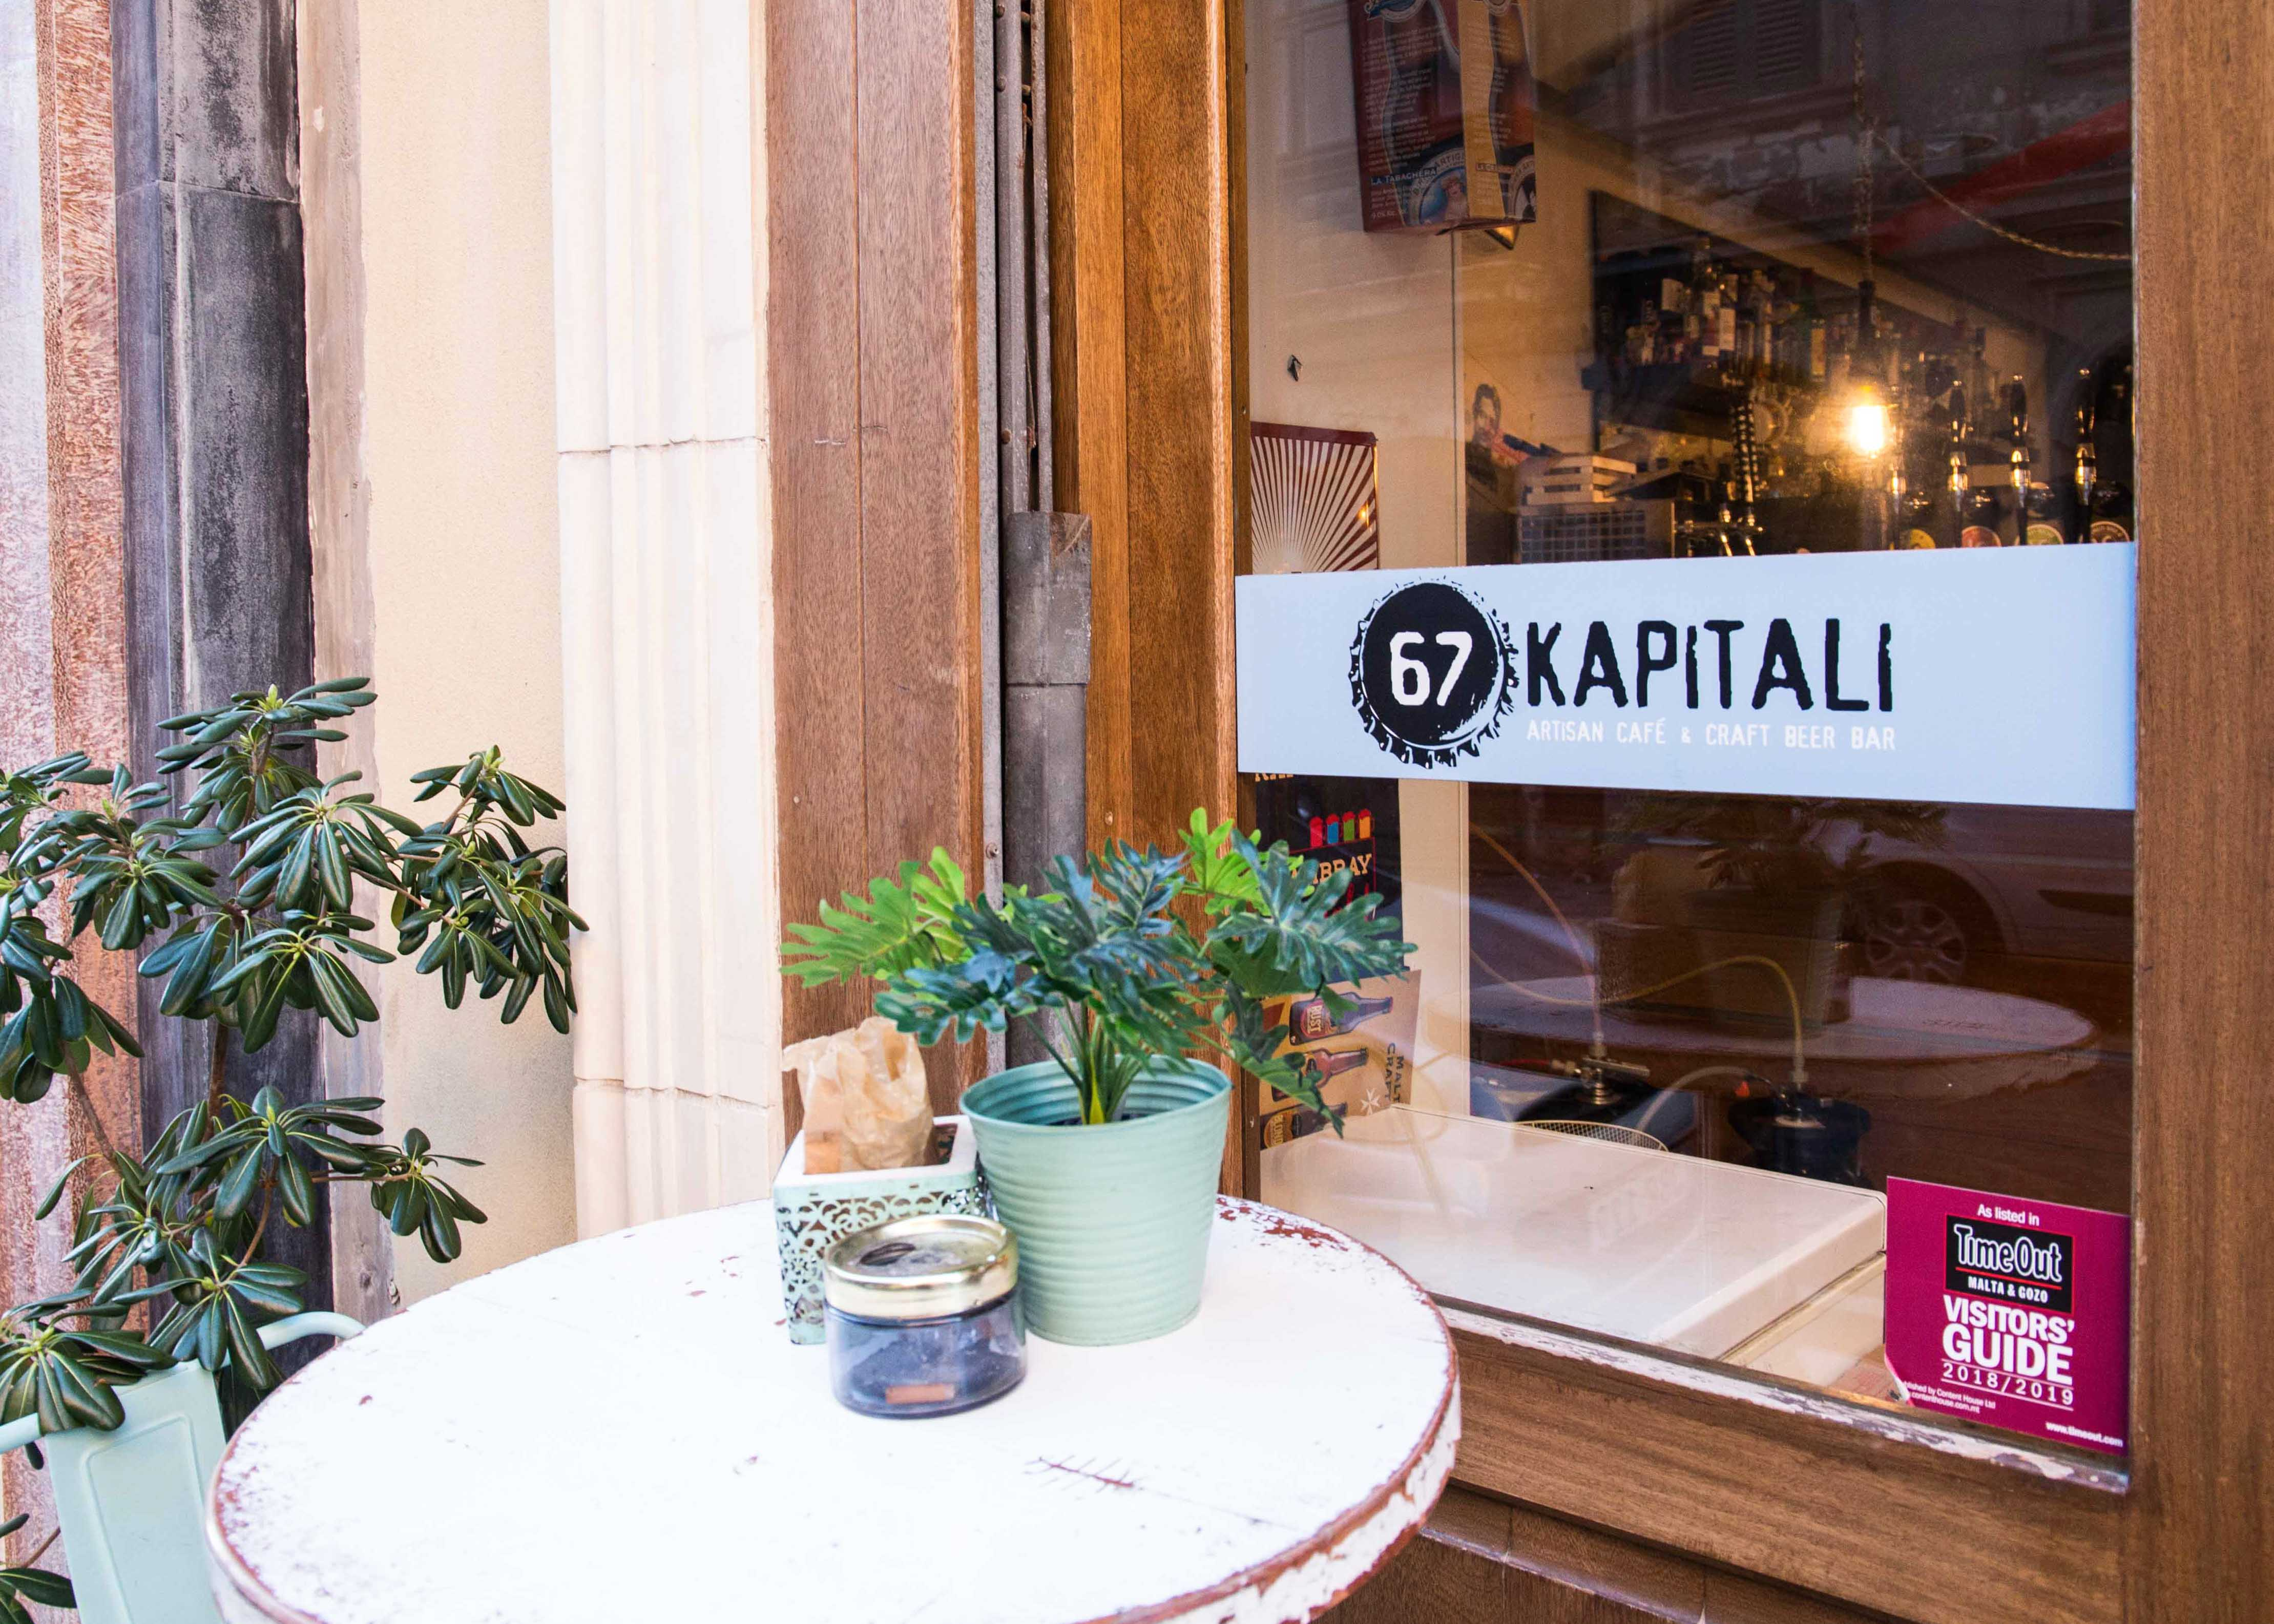 Best bar in Valletta with craft beer, open till late night, 67 Kapitali